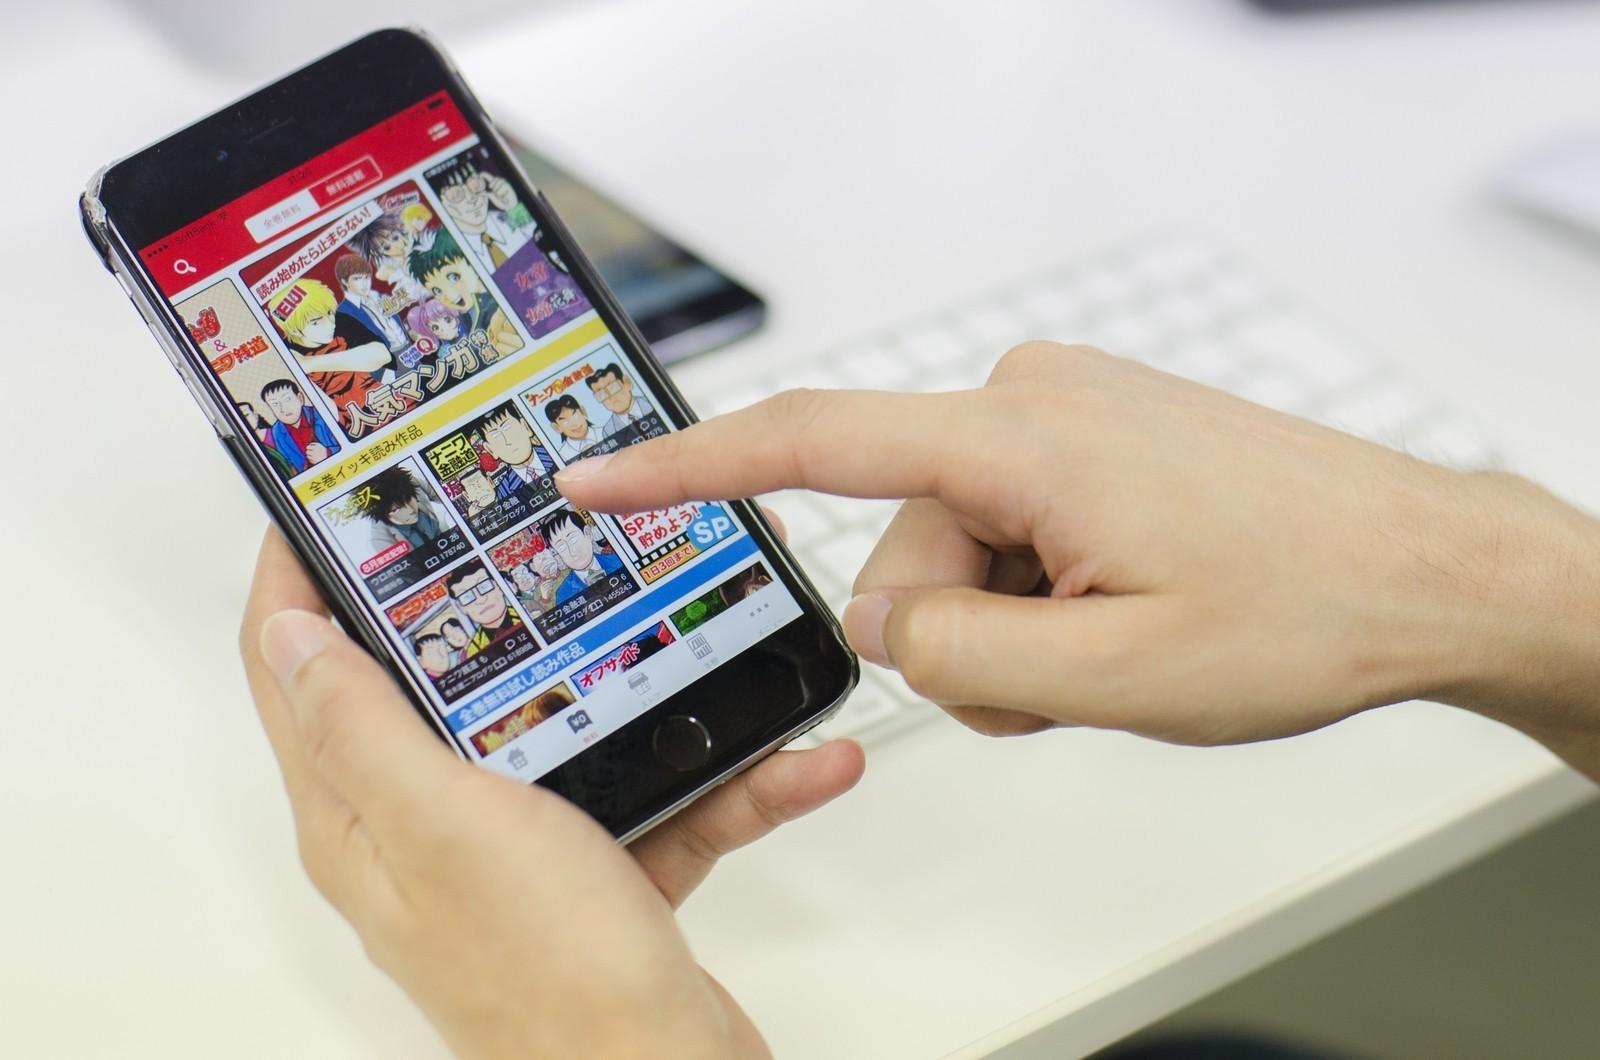 【Rails】国内最大級のコミックアプリ『マンガBANG』のリードエンジニア募集!